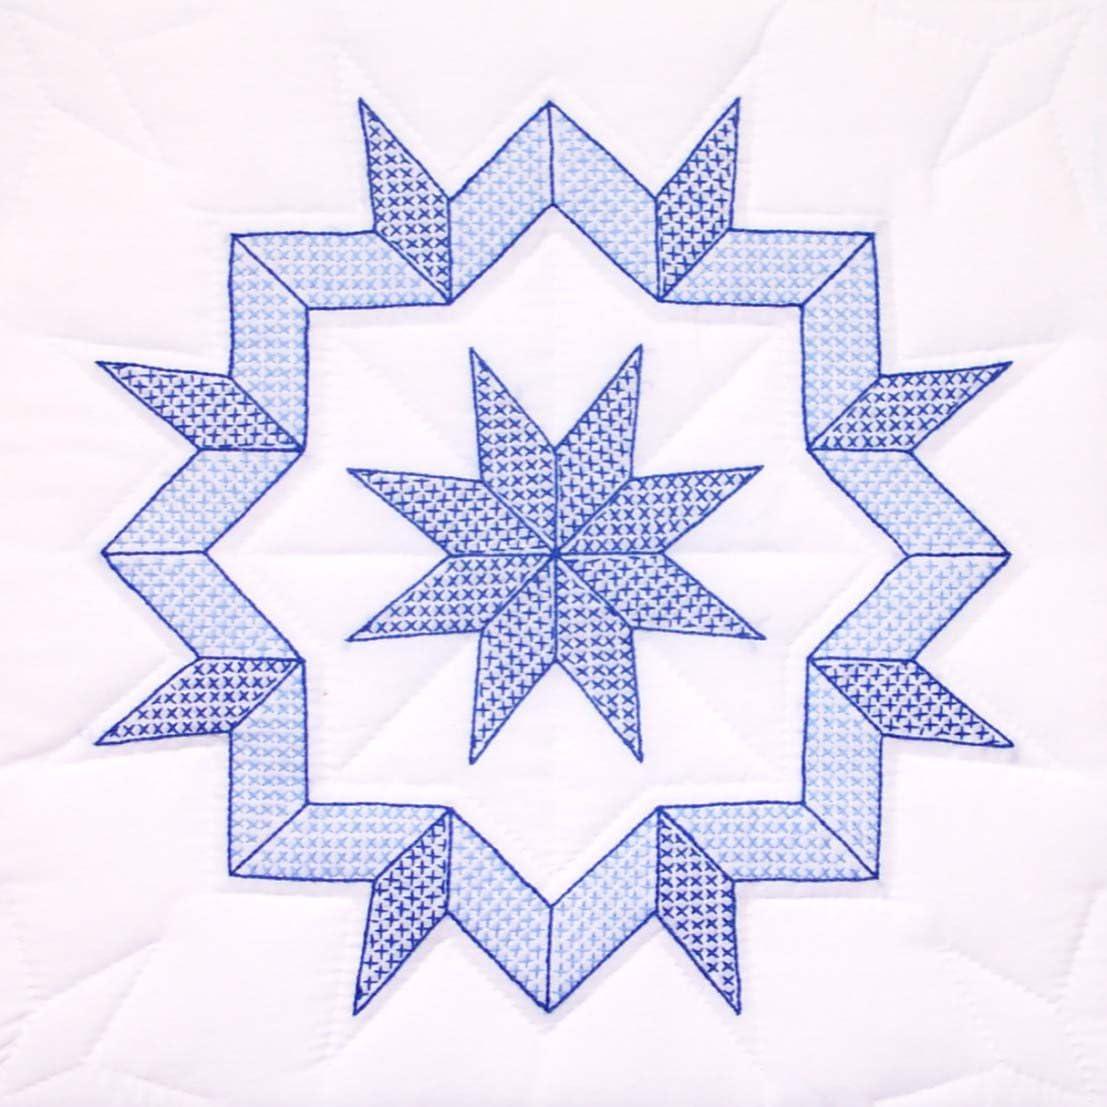 Jack Dempsey Needle Art 732293 Interlocking Hummingbird Quilt Blocks 6 18-Inch